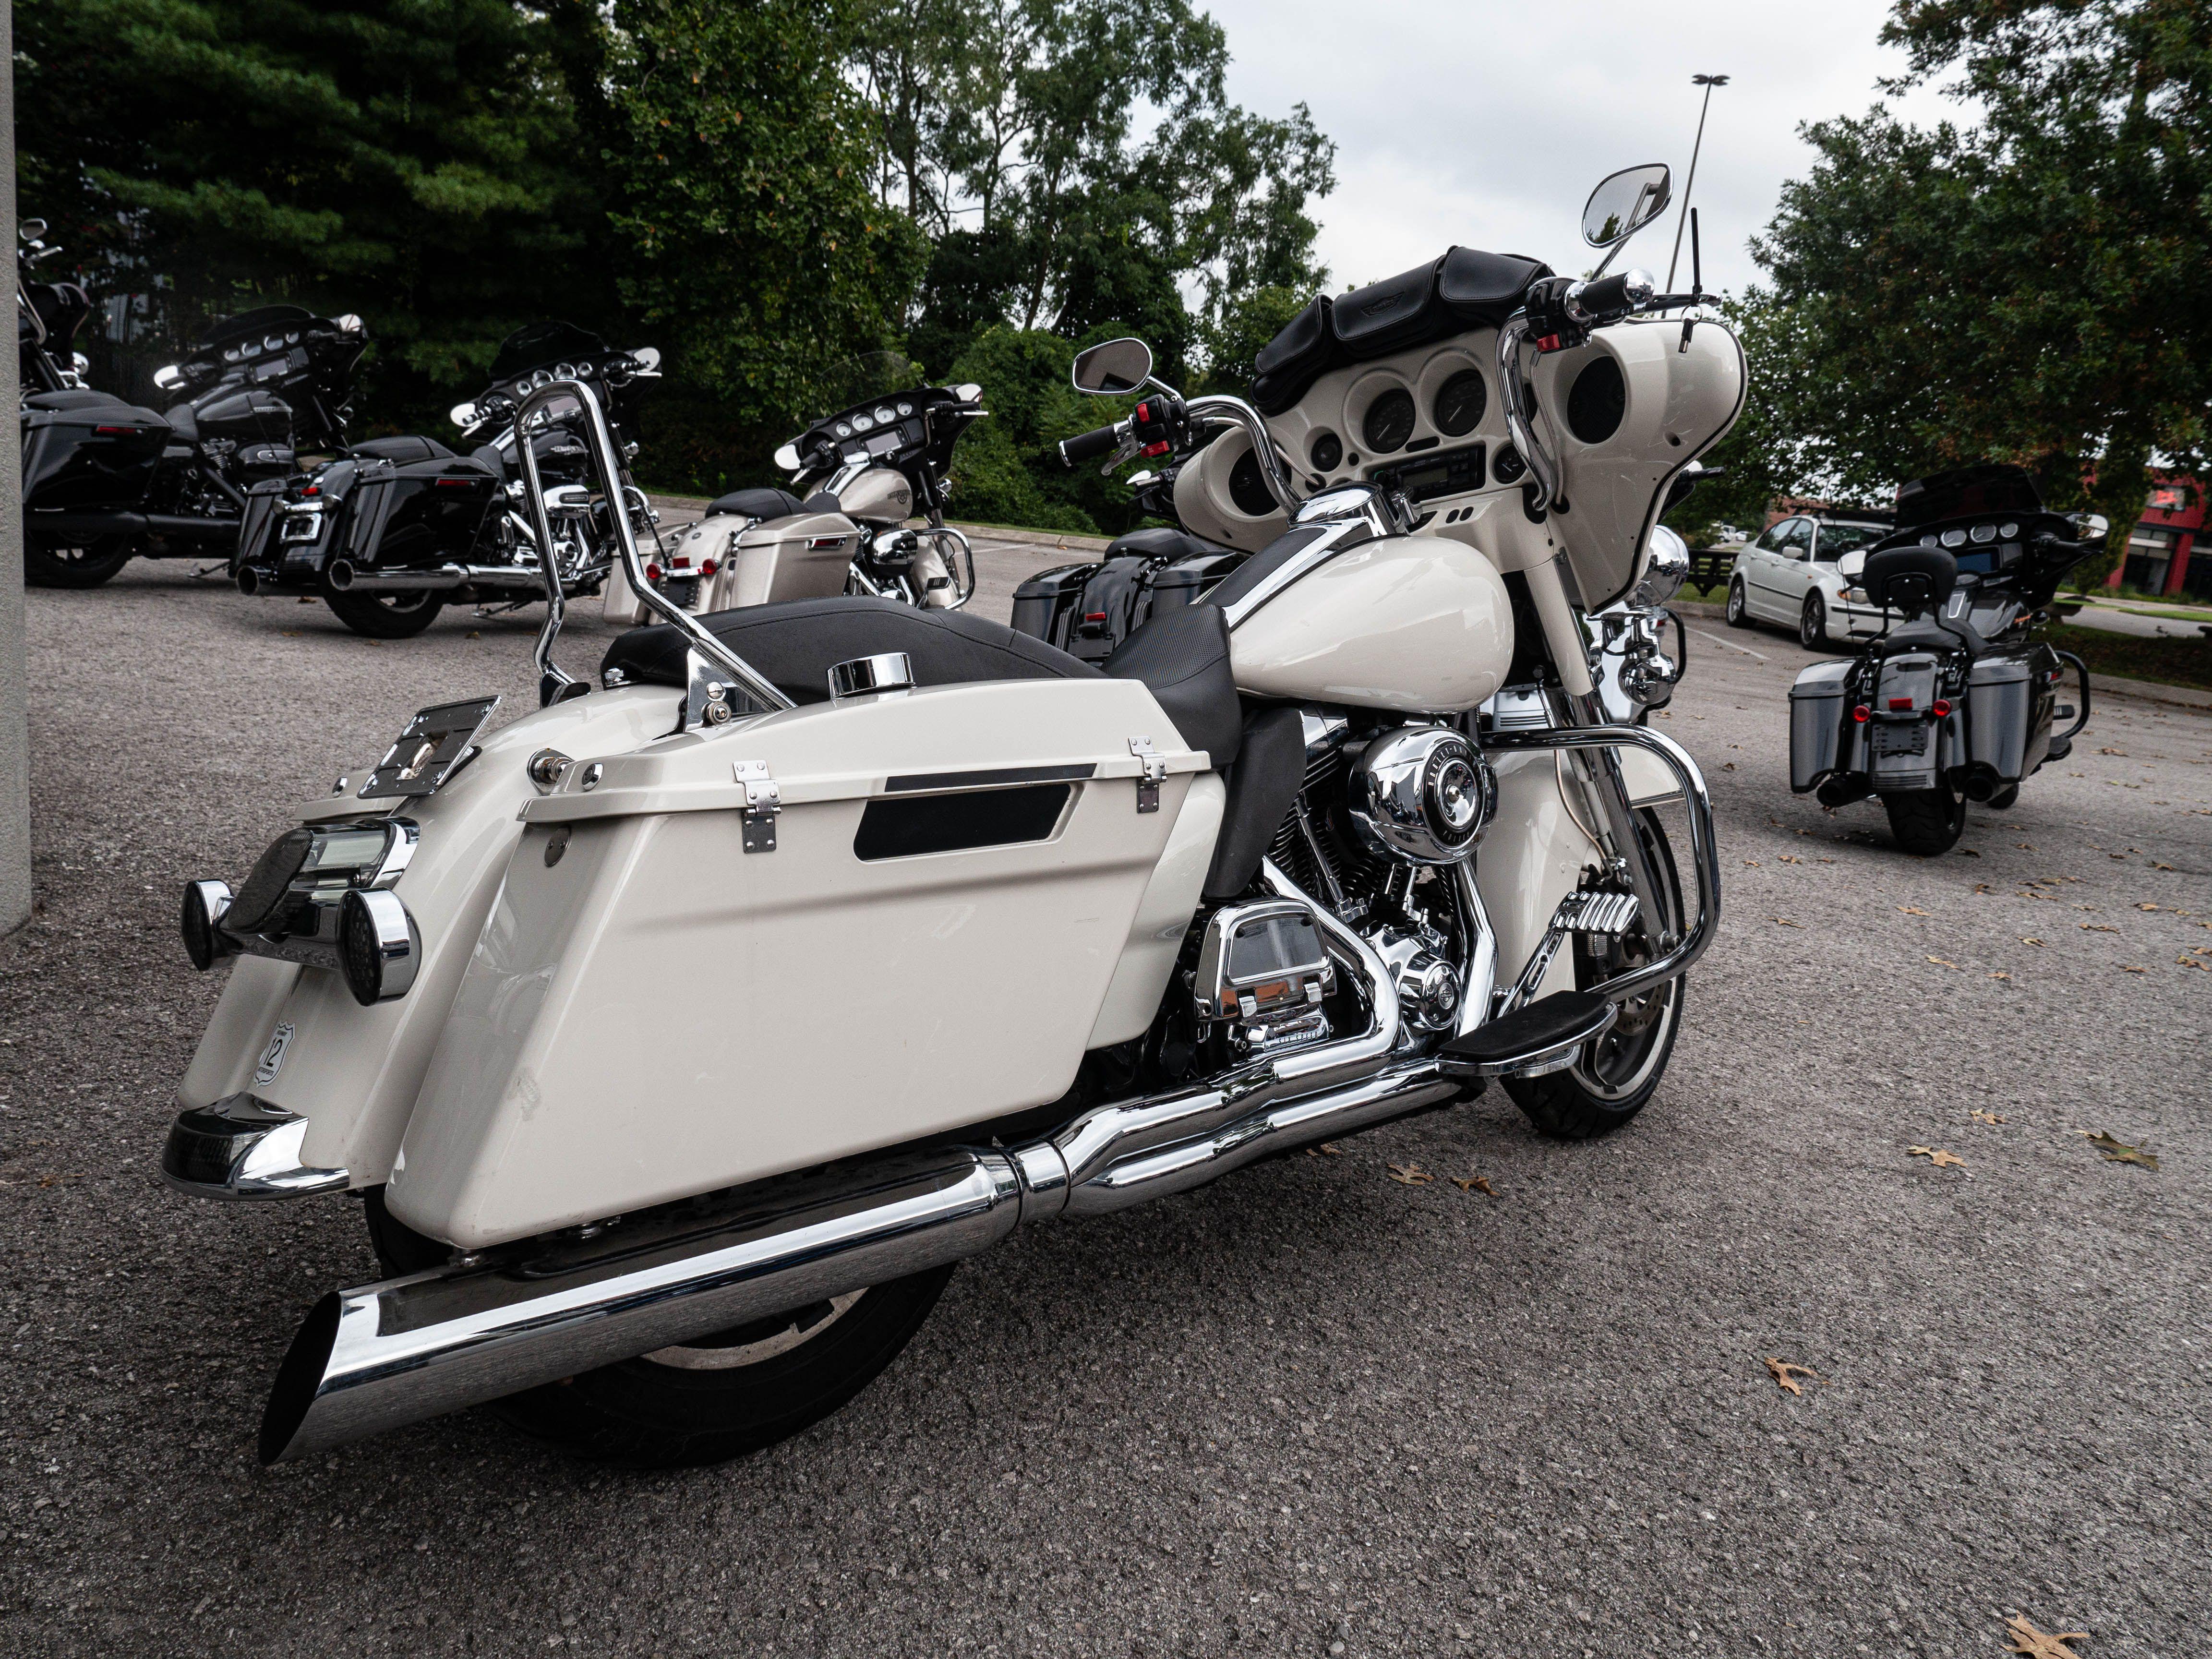 Pre-Owned 2012 Harley-Davidson Electra Glide Police